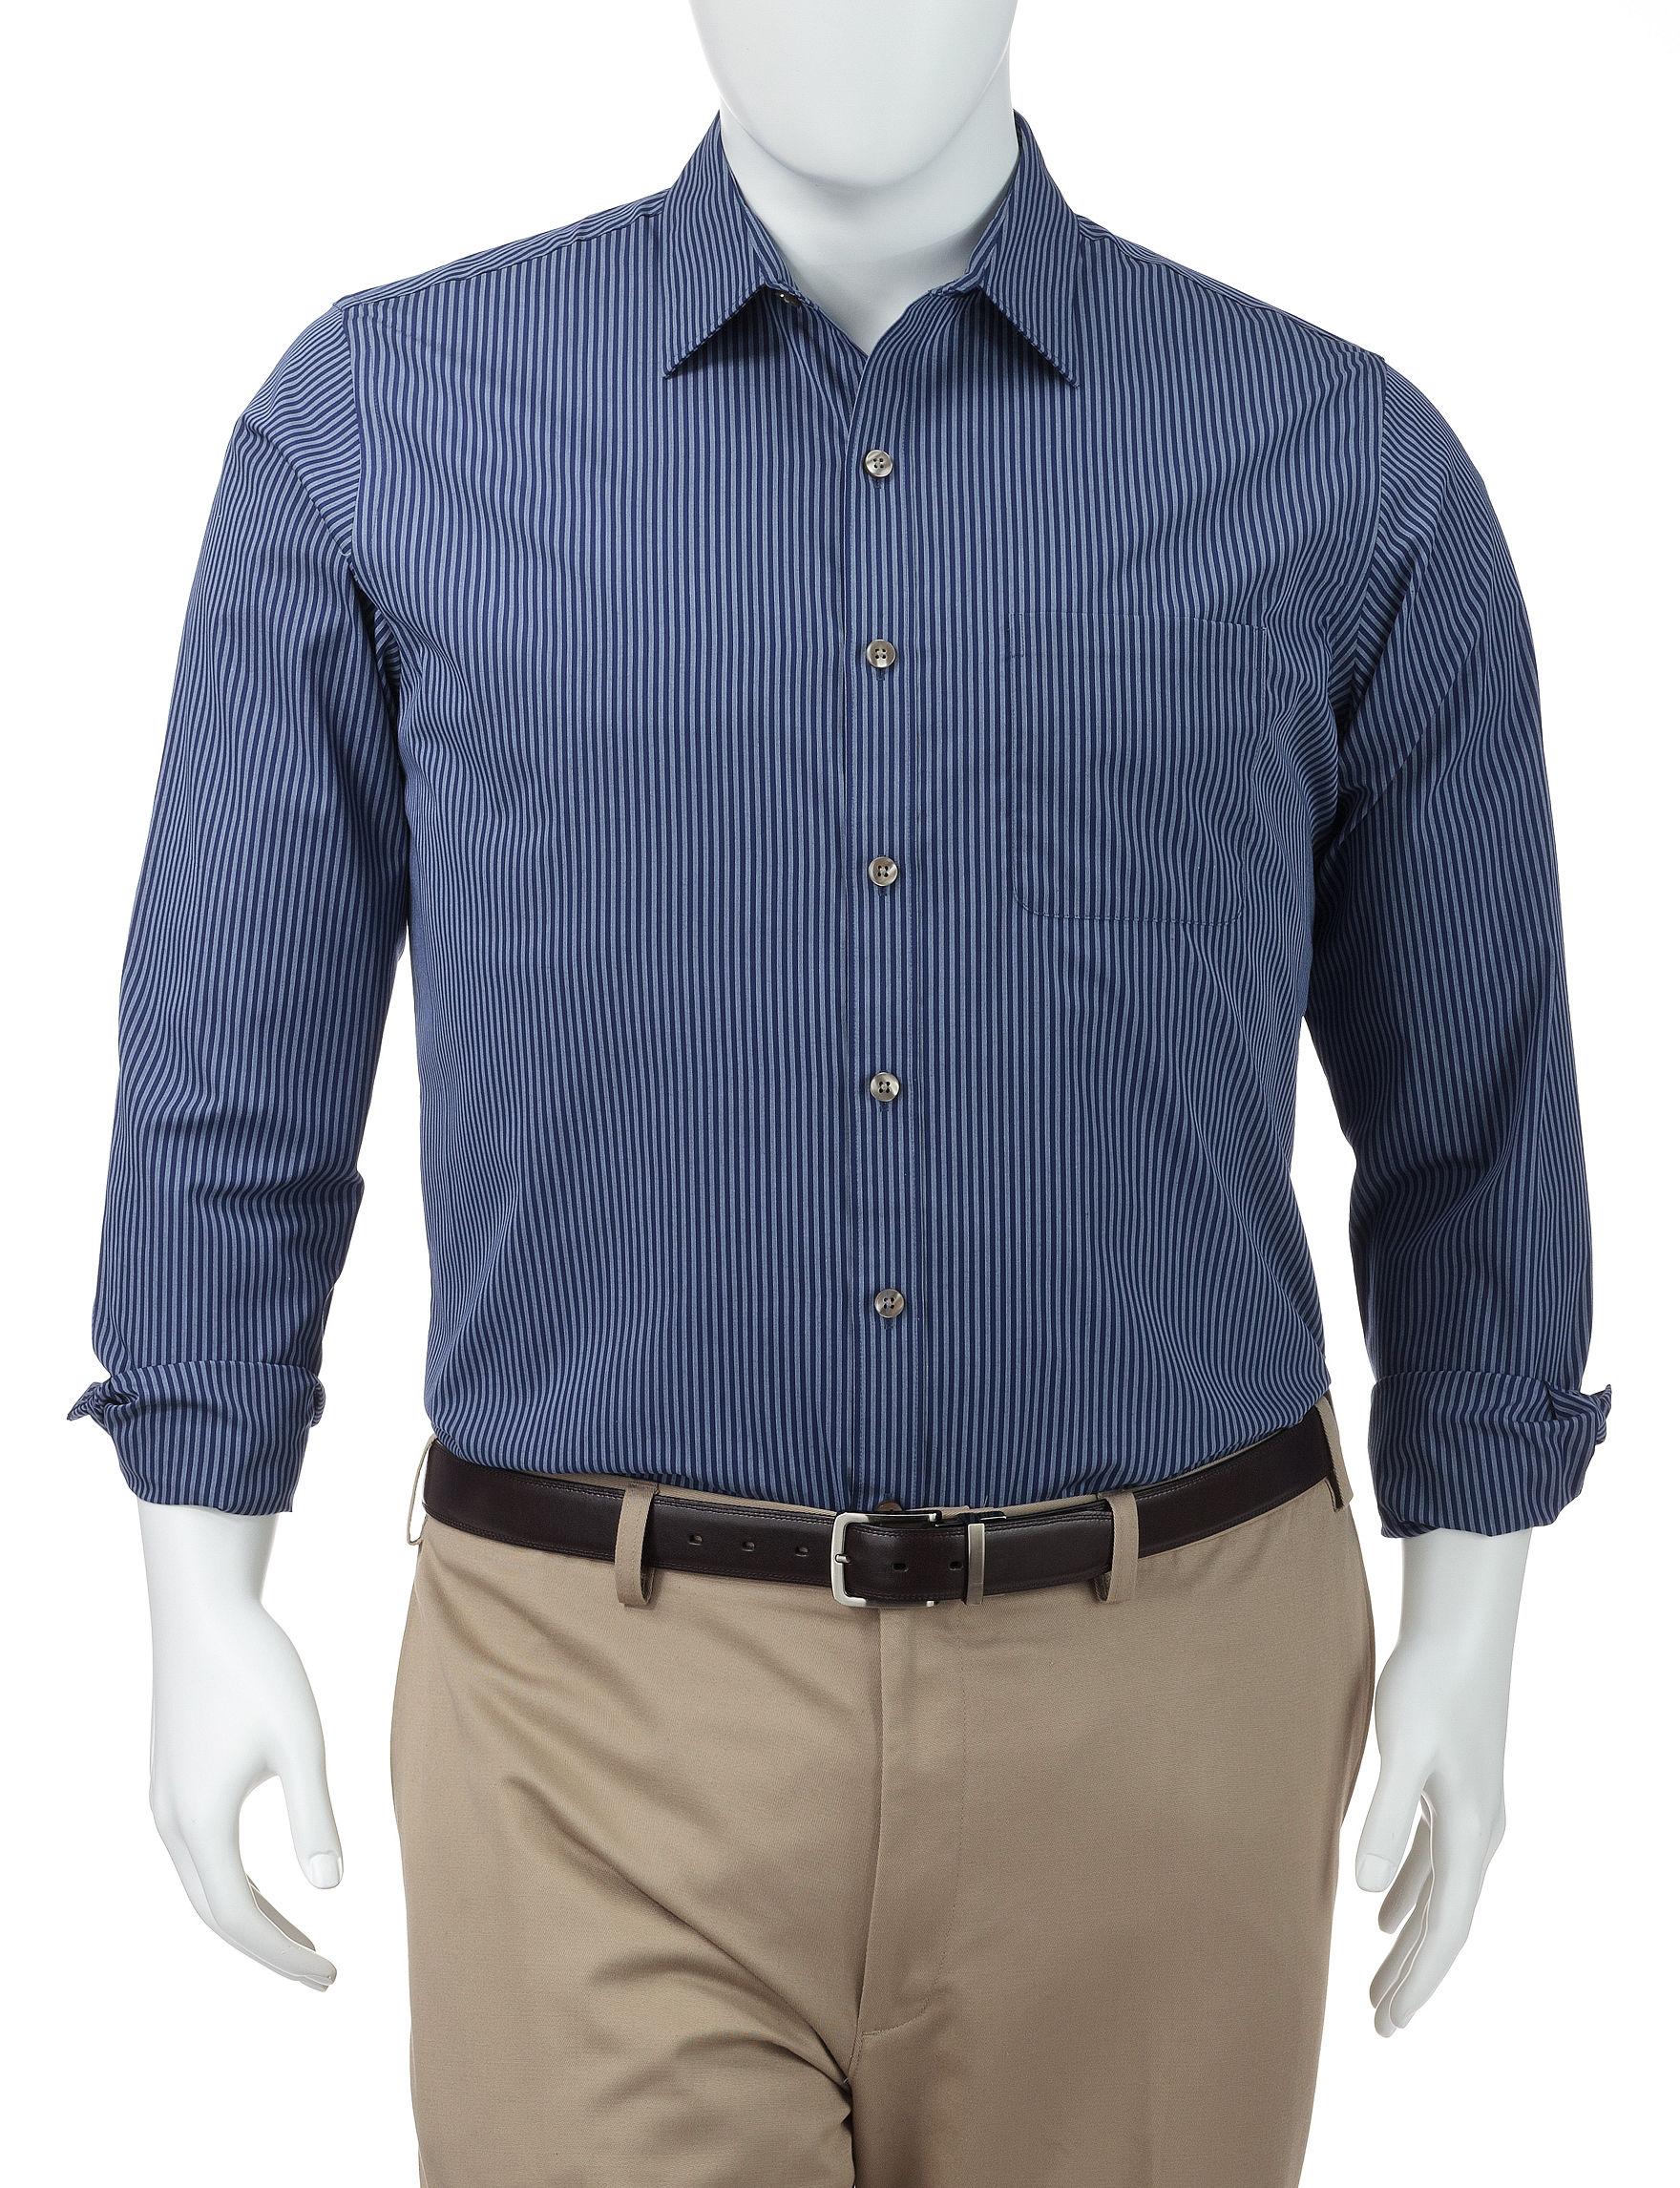 Van Heusen Blue Depths Casual Button Down Shirts